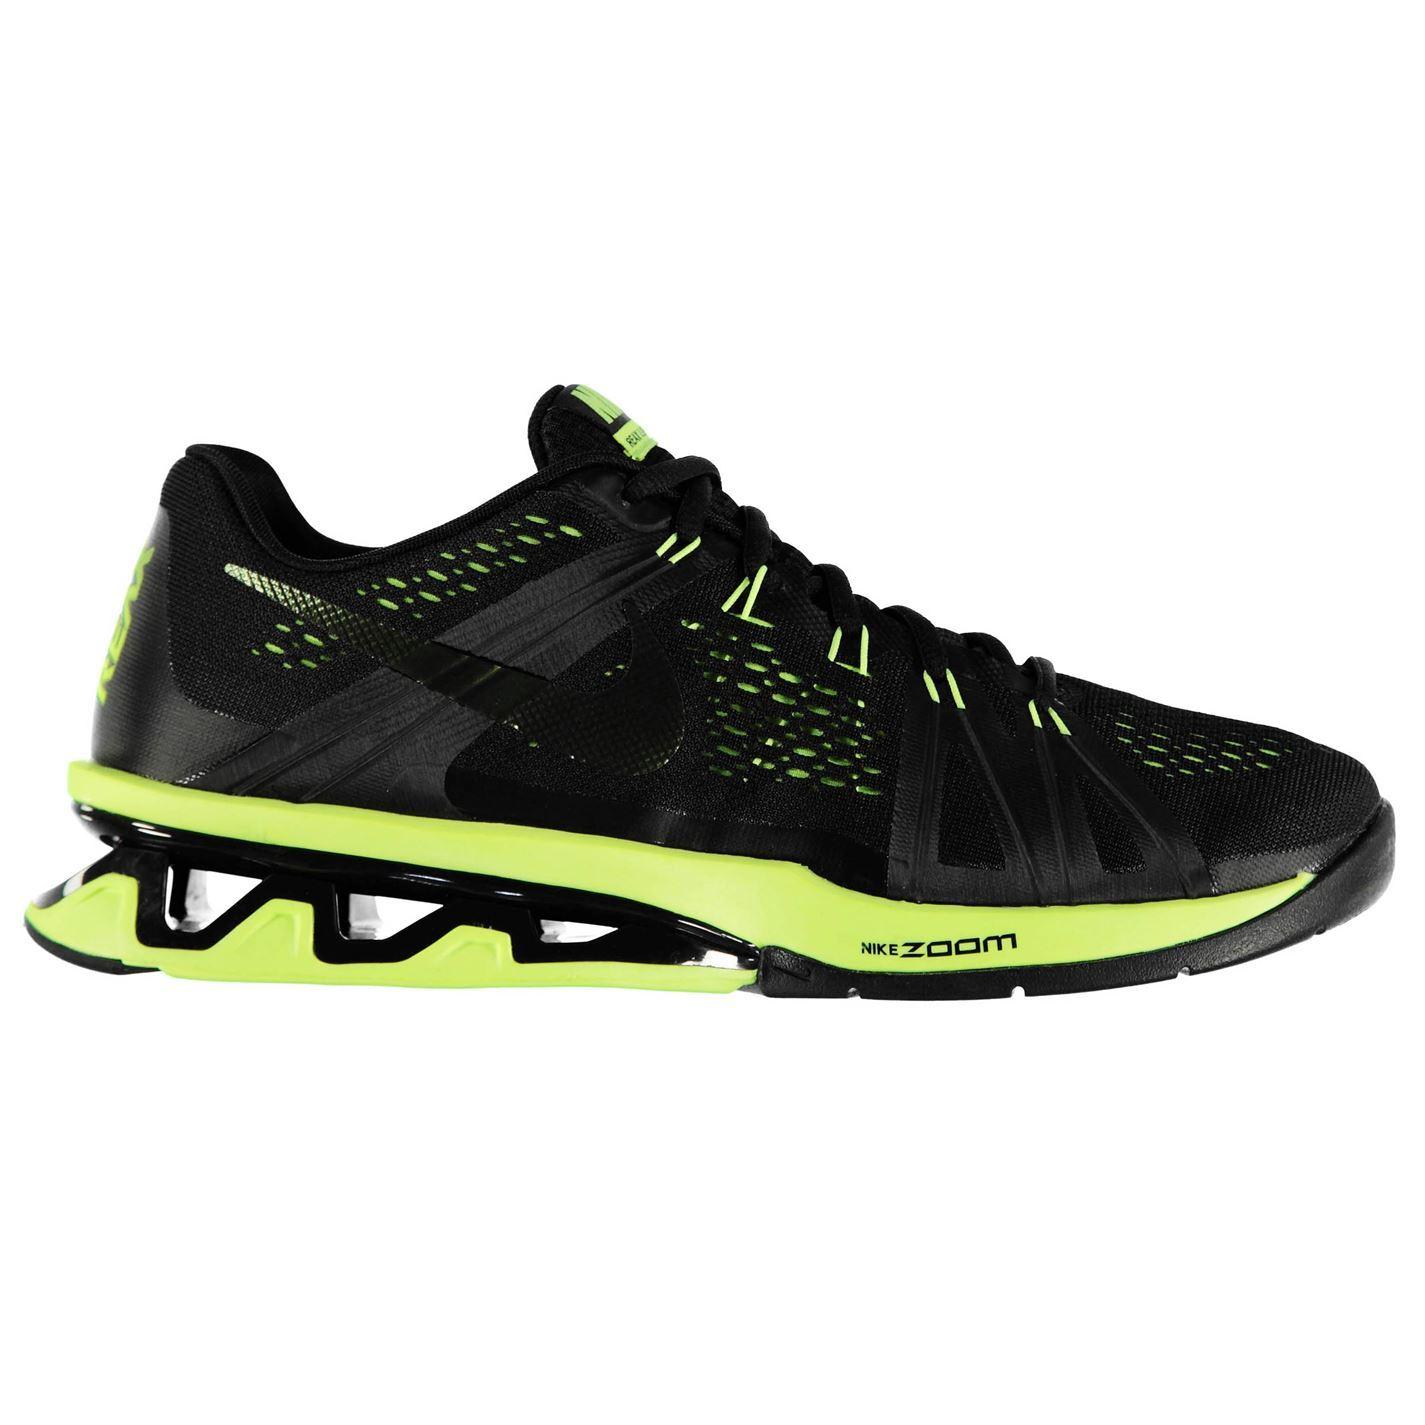 Nike Training Shoes Vo